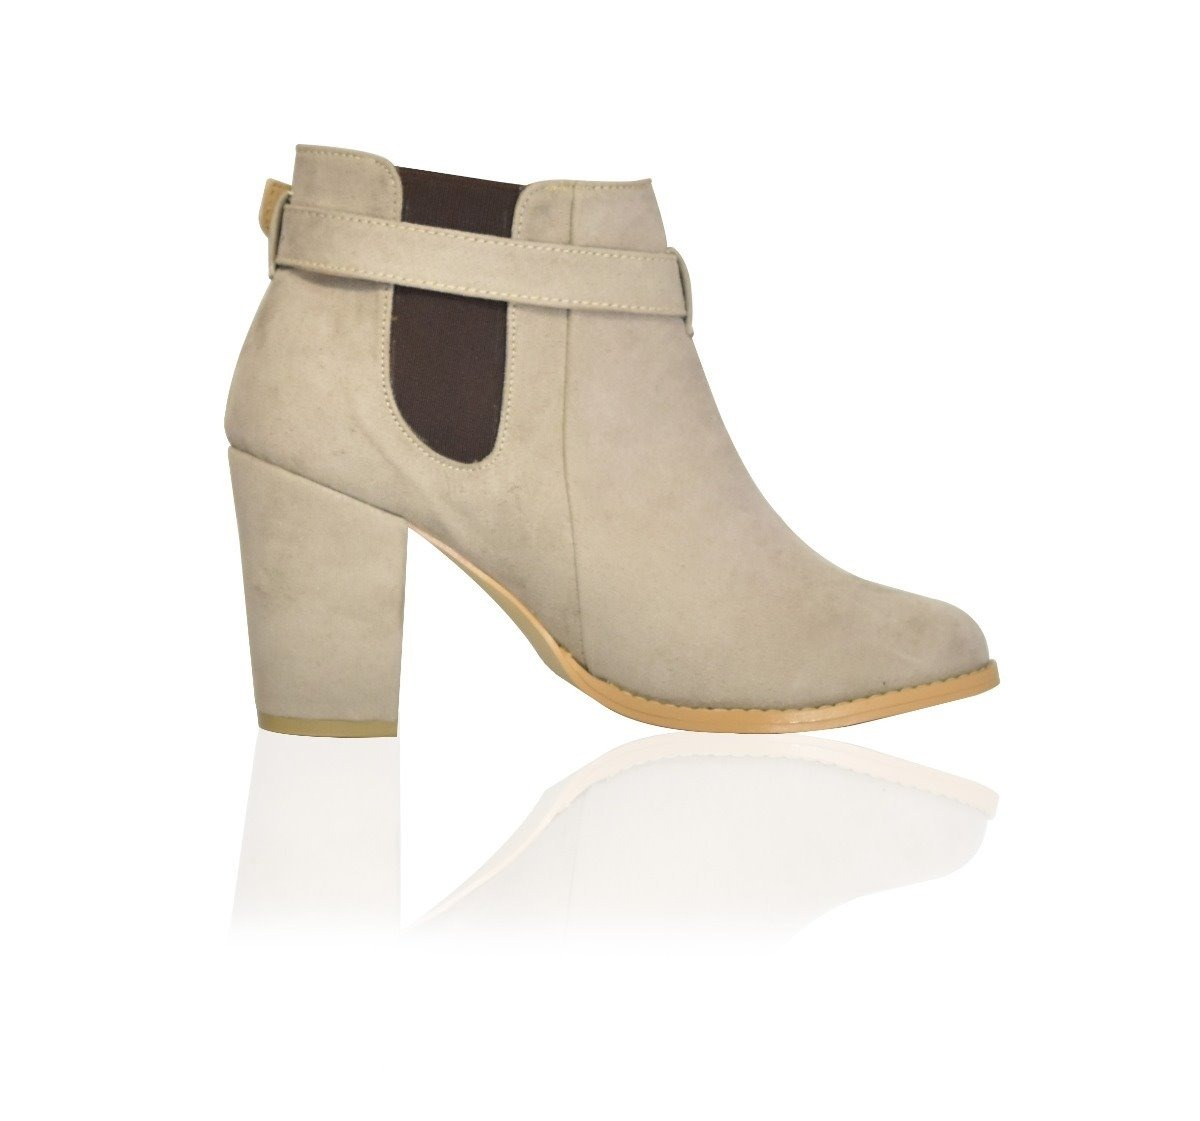 eef4267ae63 Zapatos Dama Ancho Gamuza Maquillaje M2035 Mujer Tacon Botin BBwq4grFC